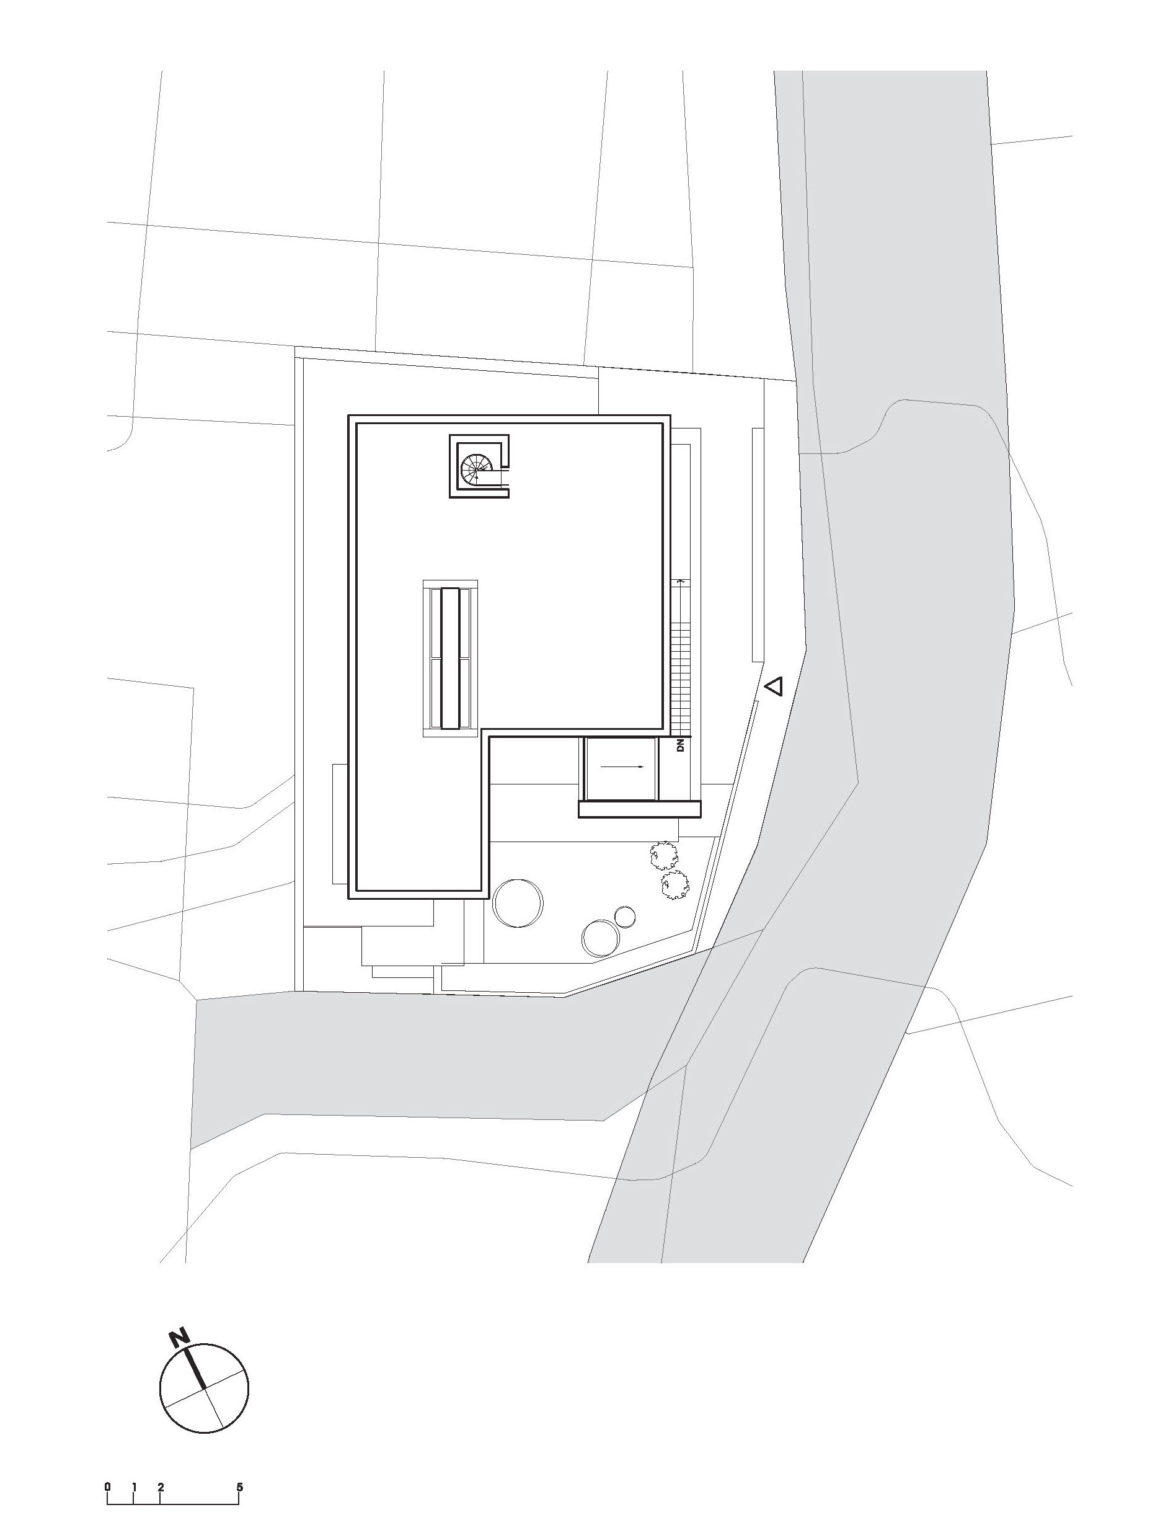 Customi-Zip by L'EAU Design (27)